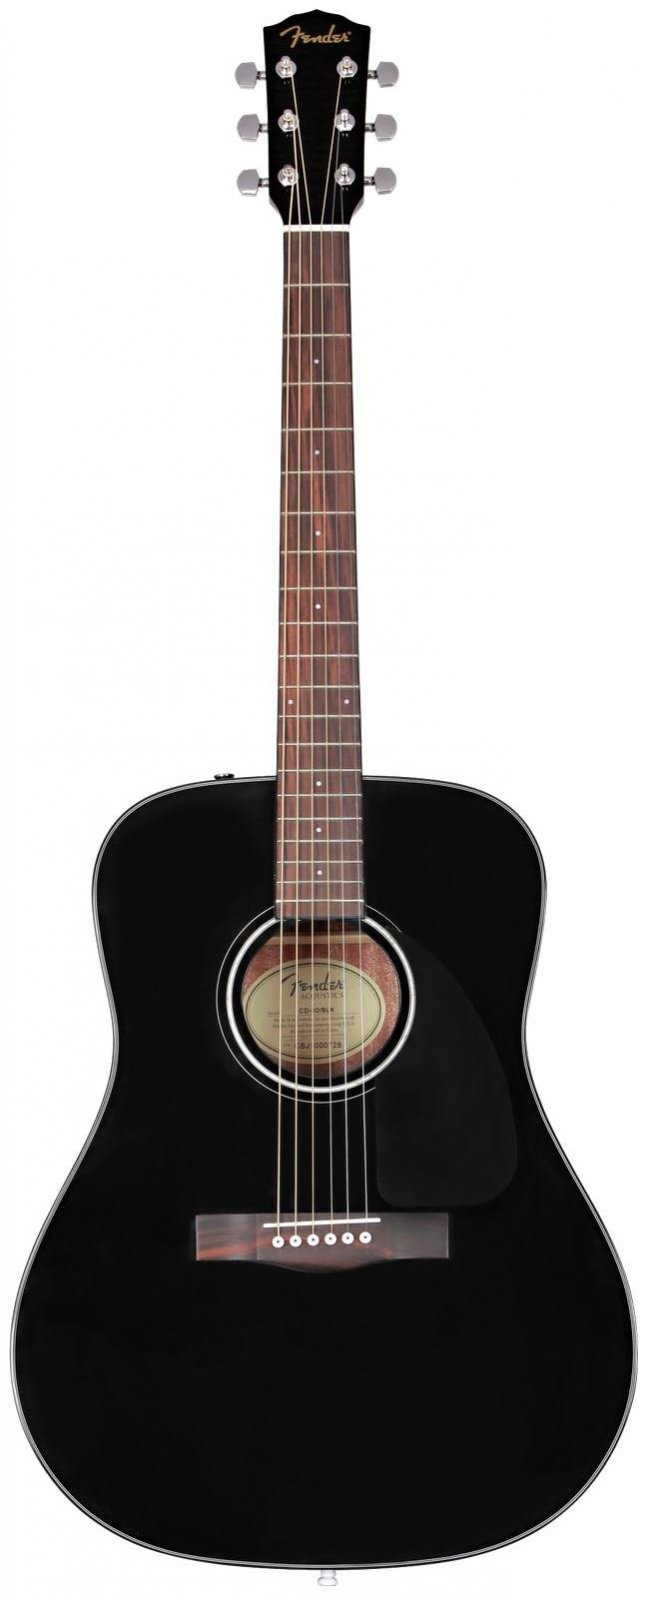 Fender CD-60 Dreadnought V3 w/Case, Walnut Fingerboard - Black